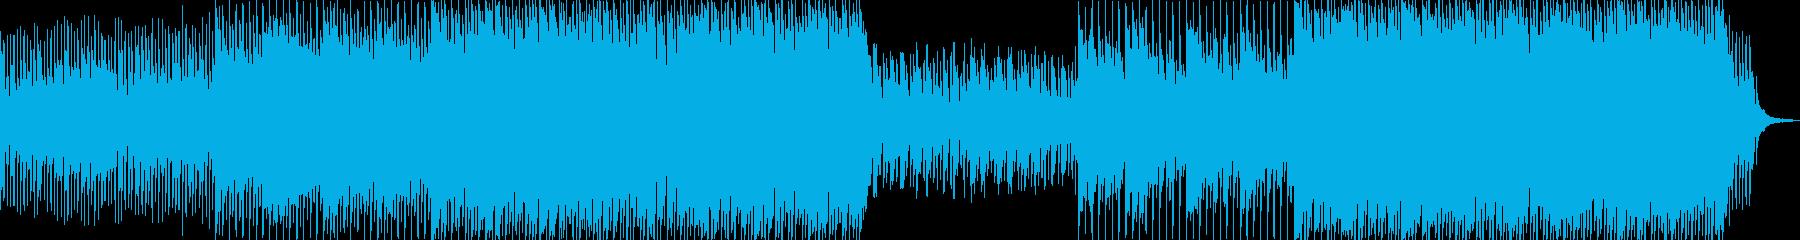 Infinity Presentatioの再生済みの波形